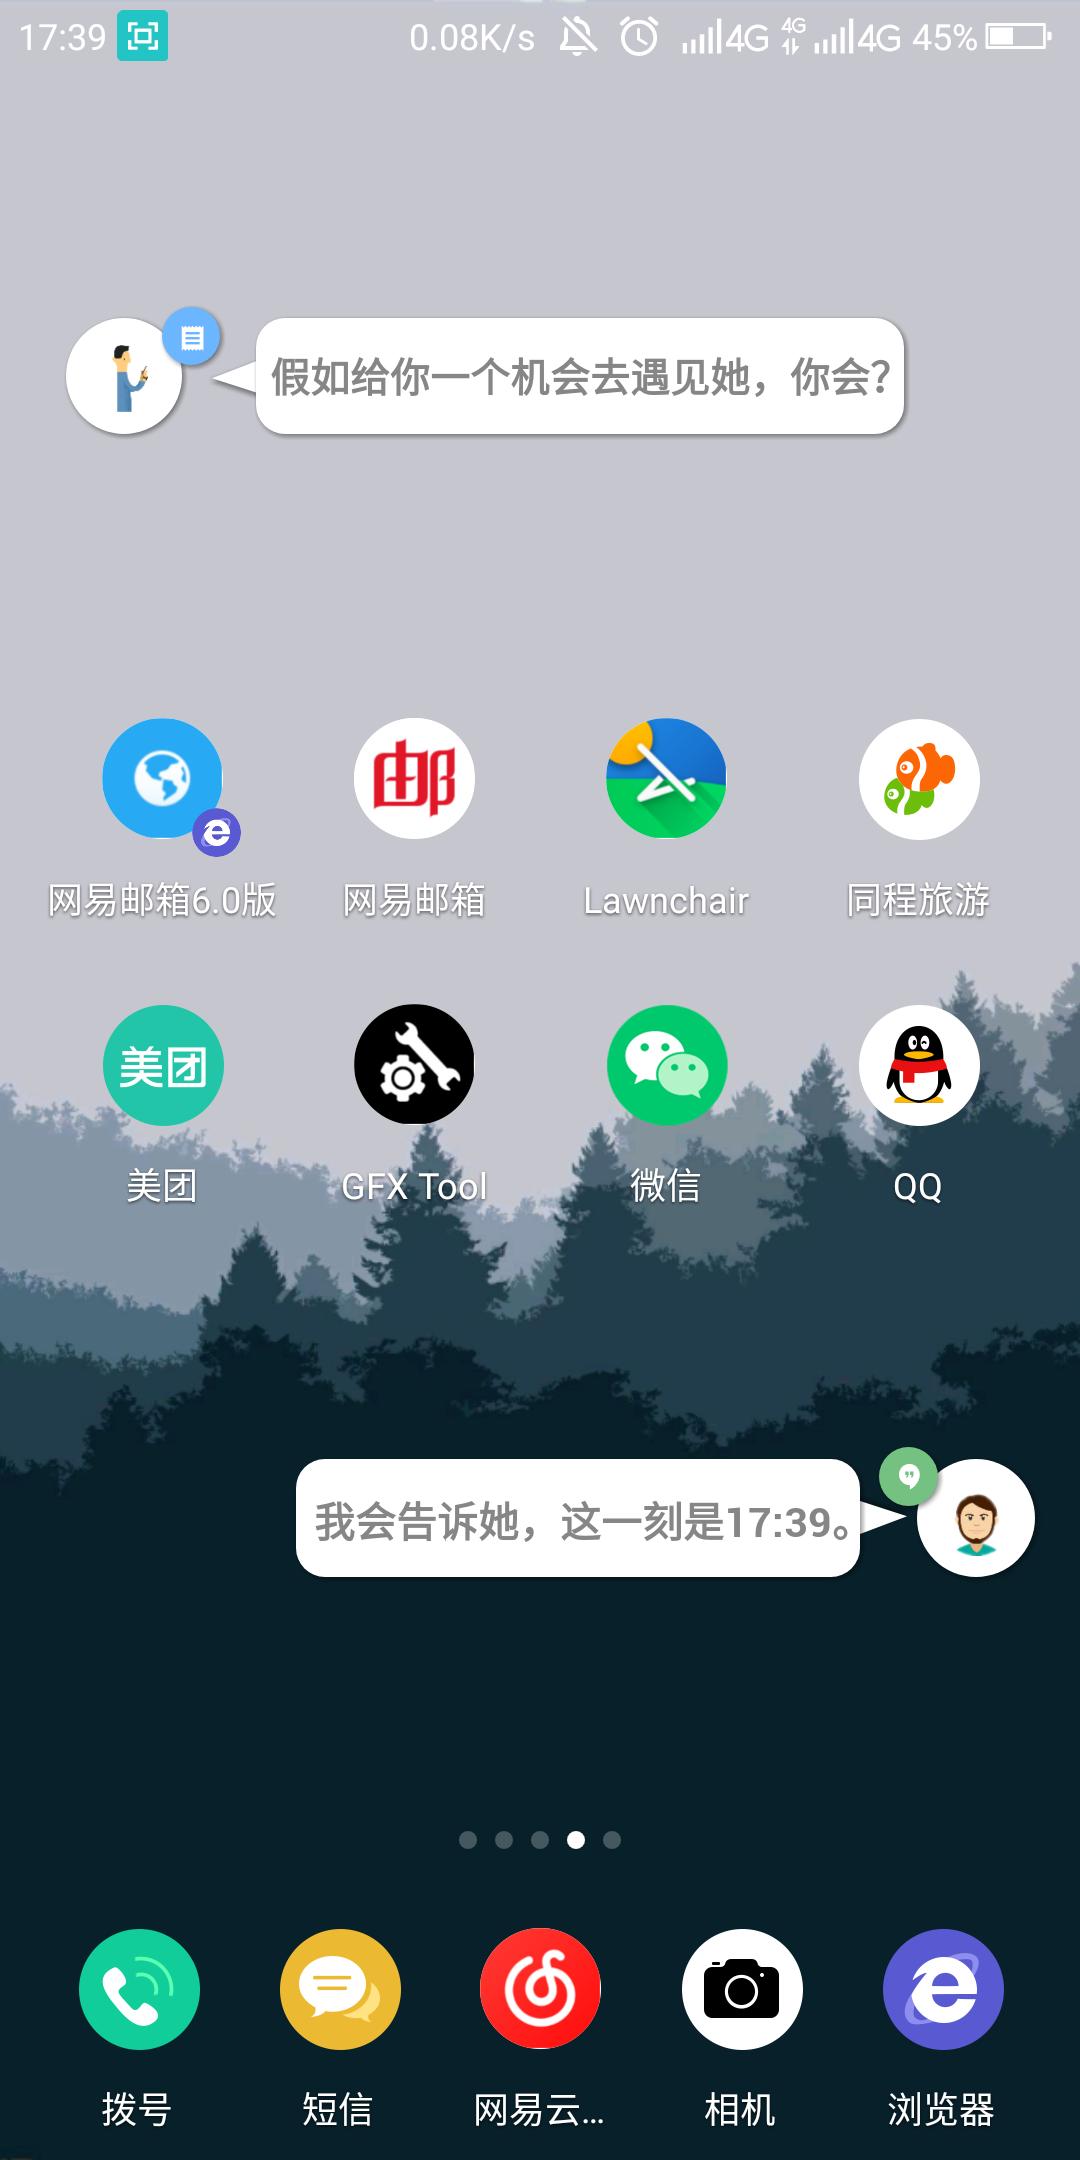 Screenshot_2019-04-11-17-39-56.png